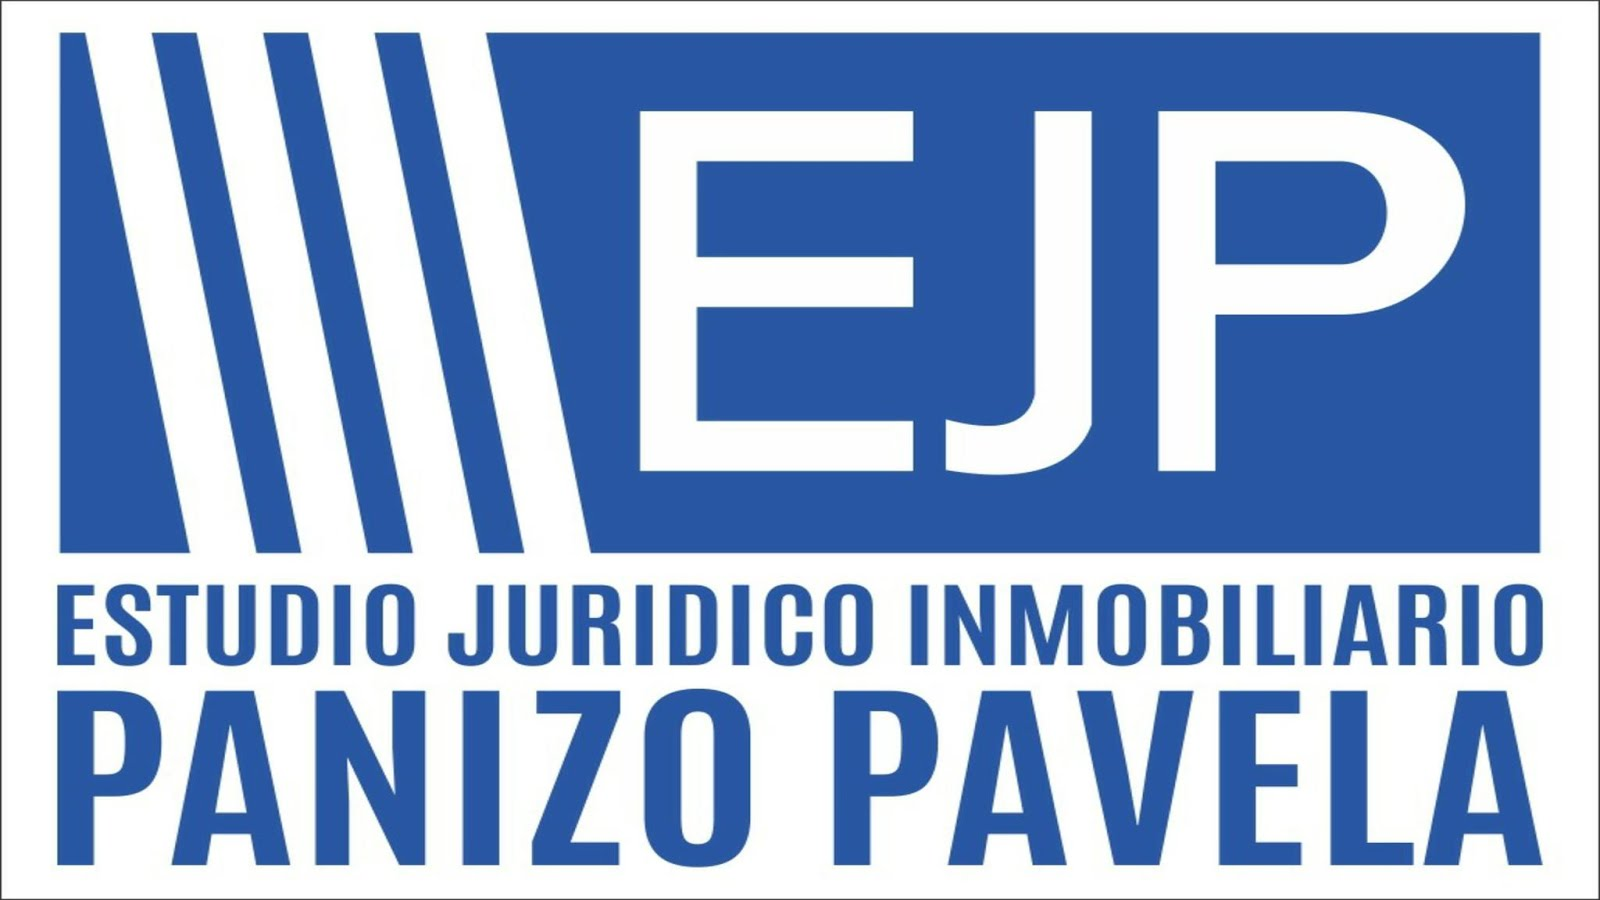 Abogados Mar del Plata | Dra. Fernanda Panizo | Abogados - Estudio Jurídico Panizo